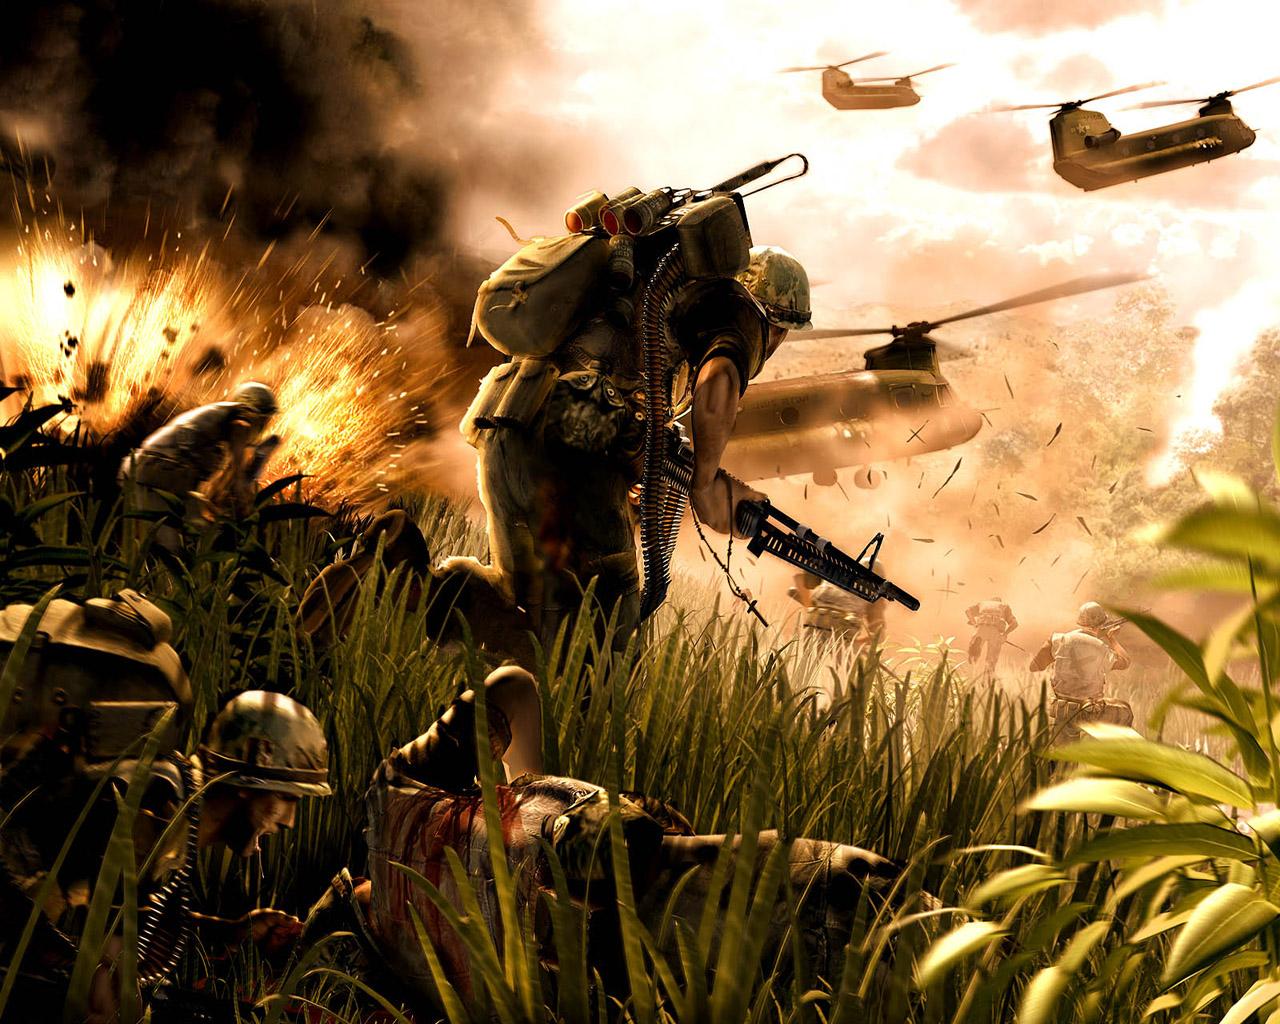 http://4.bp.blogspot.com/-2ZEy7TKebpk/Ti4pqjiV5xI/AAAAAAAAAEk/w2eKNoMw_Gs/s1600/War_Games_Wallpaper_1280x1024_15.jpg